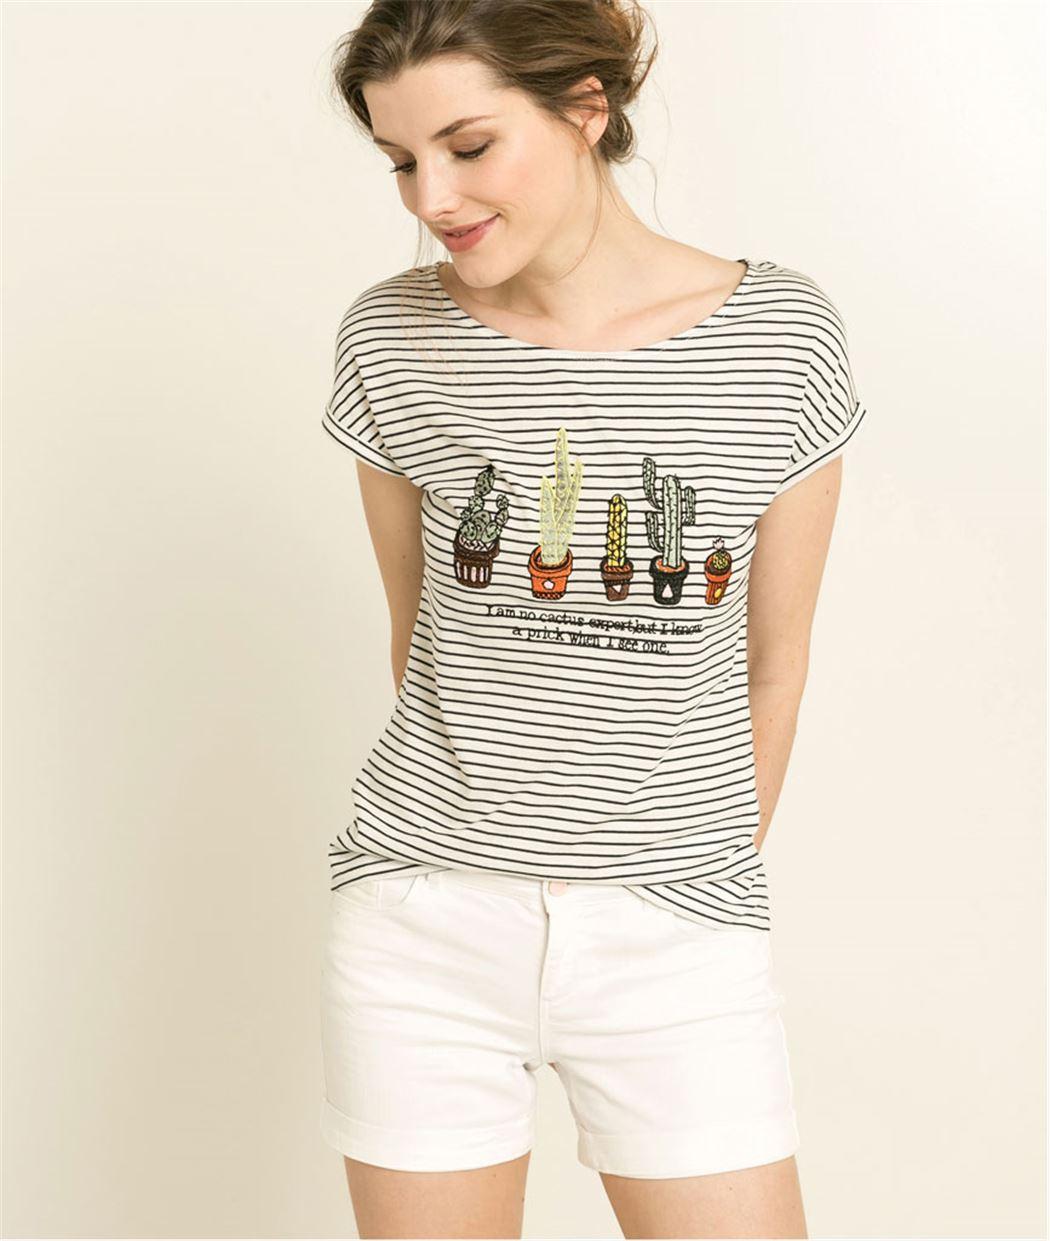 T-shirt femme rayé broderie cactus BLANC